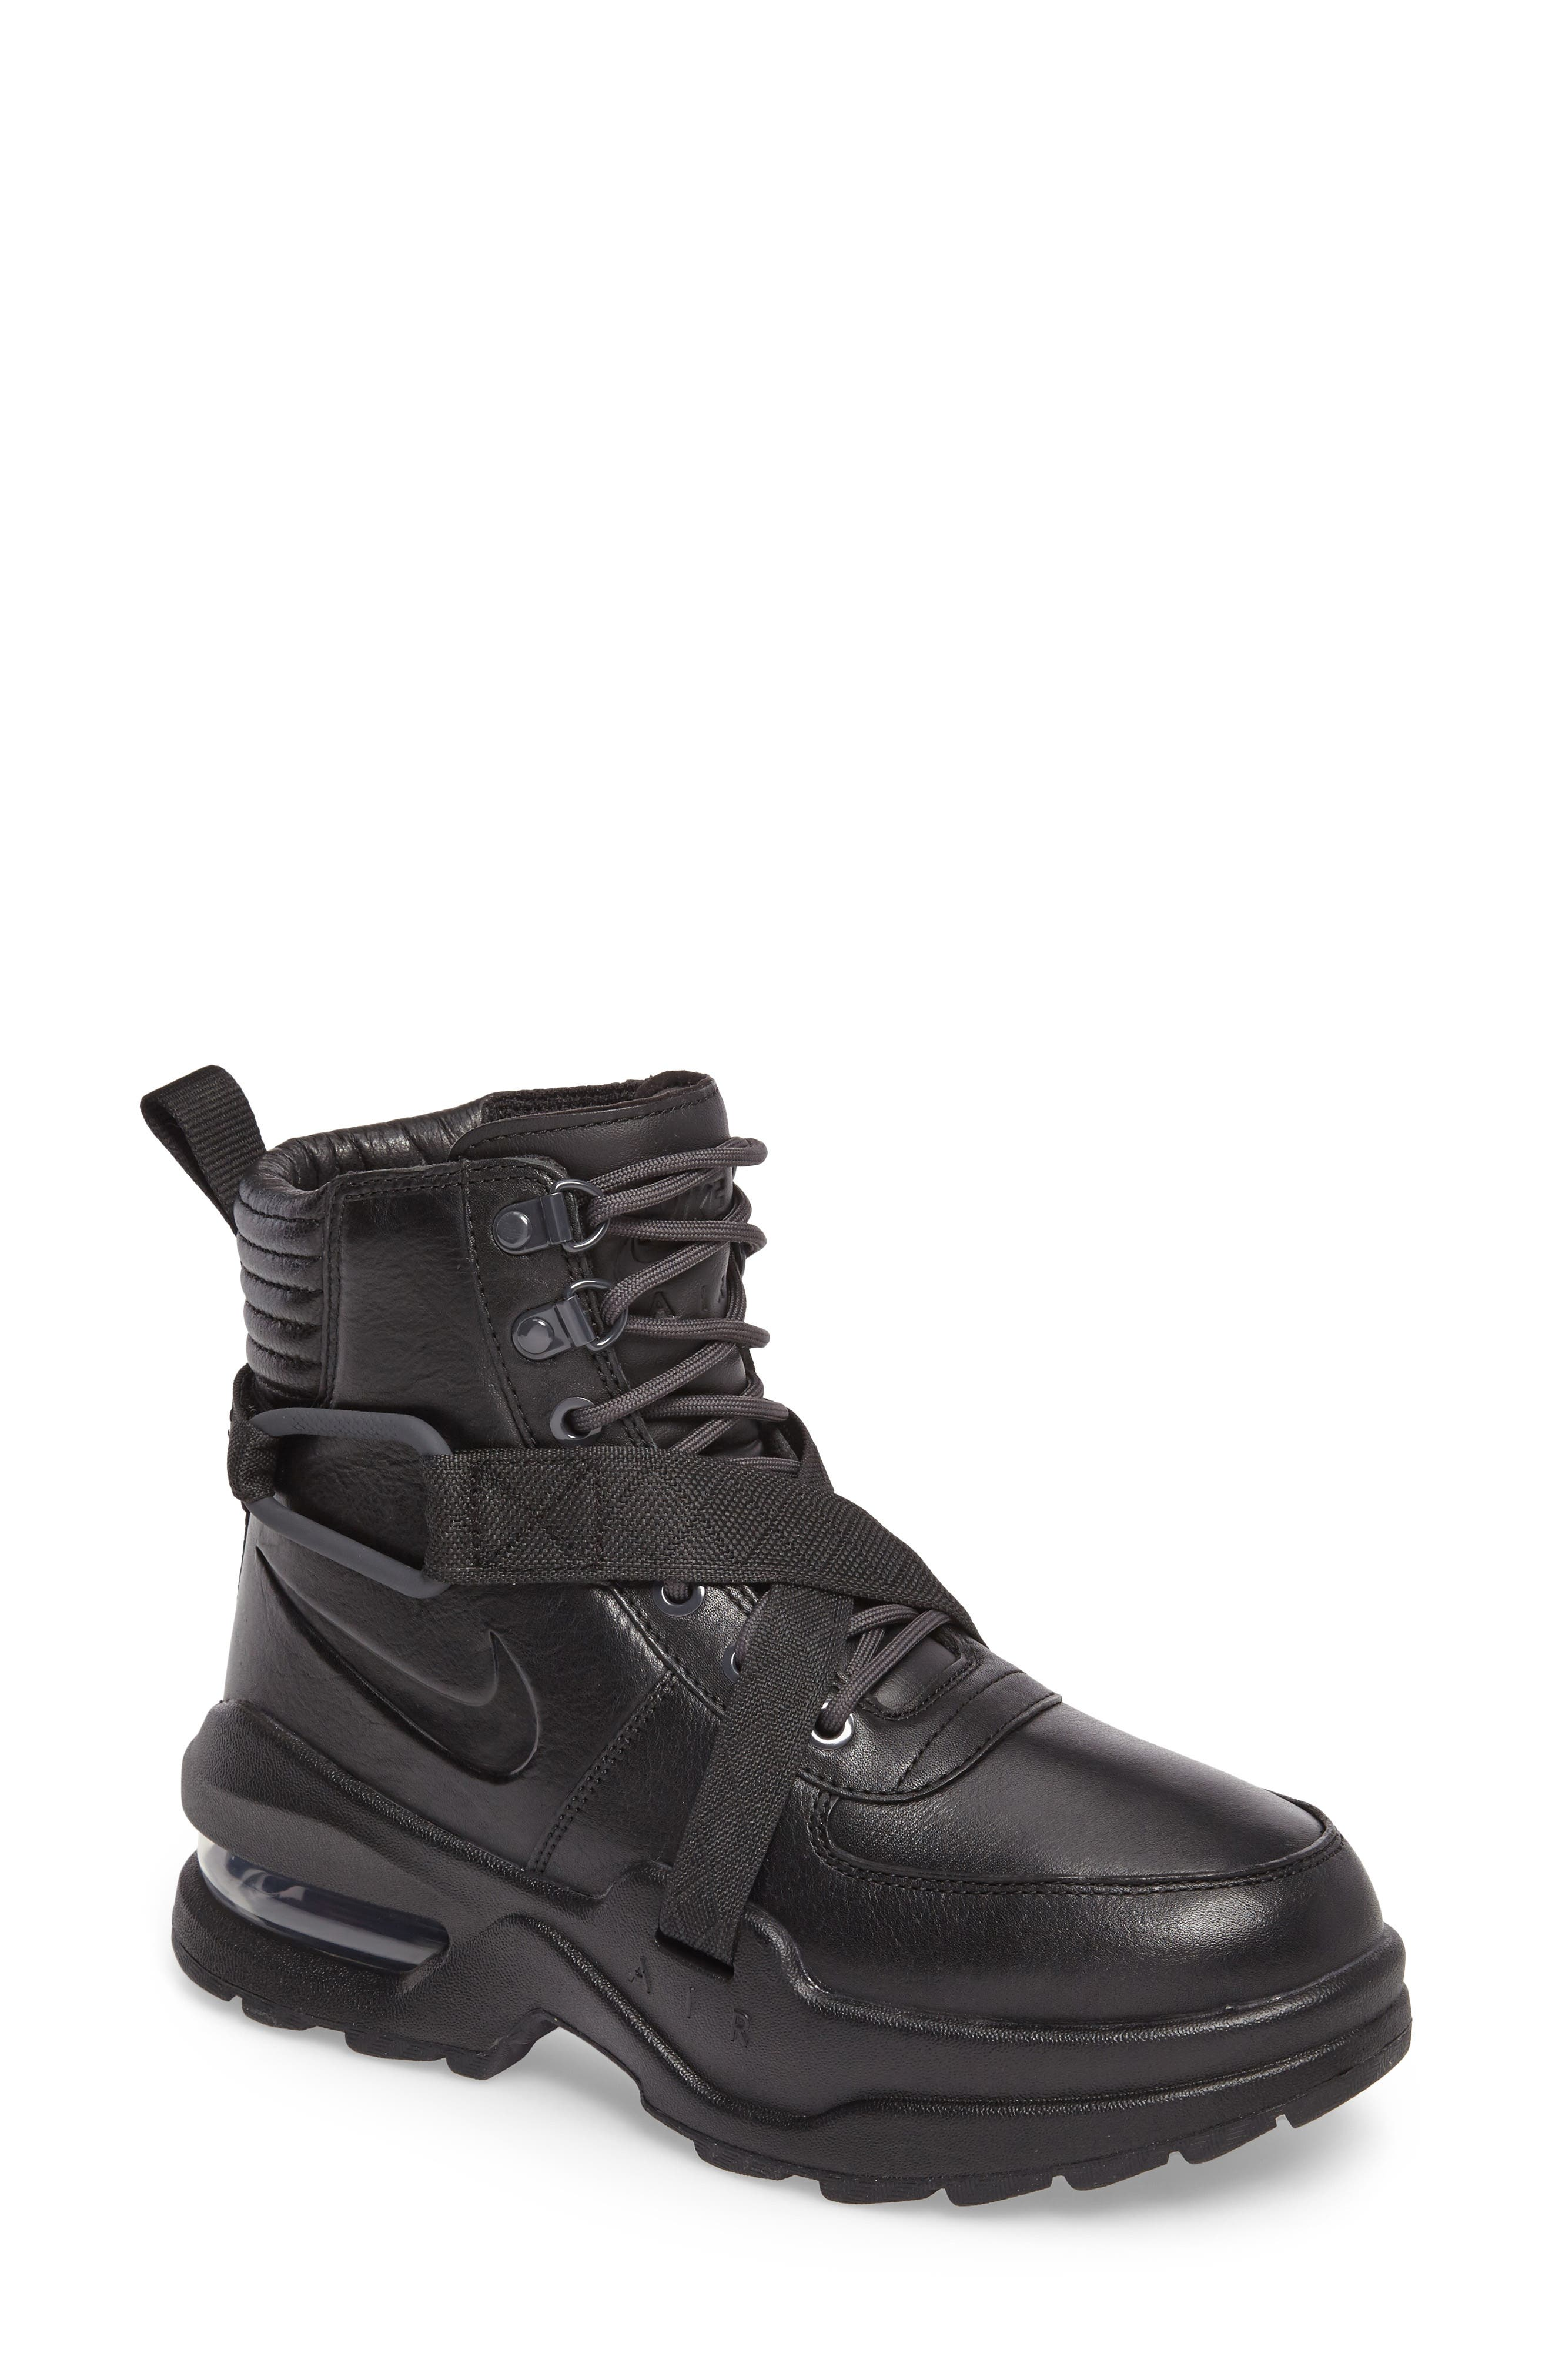 Air Max Goadome Sneaker Boot,                             Main thumbnail 1, color,                             BLACK/ ANTHRACITE/ BLACK